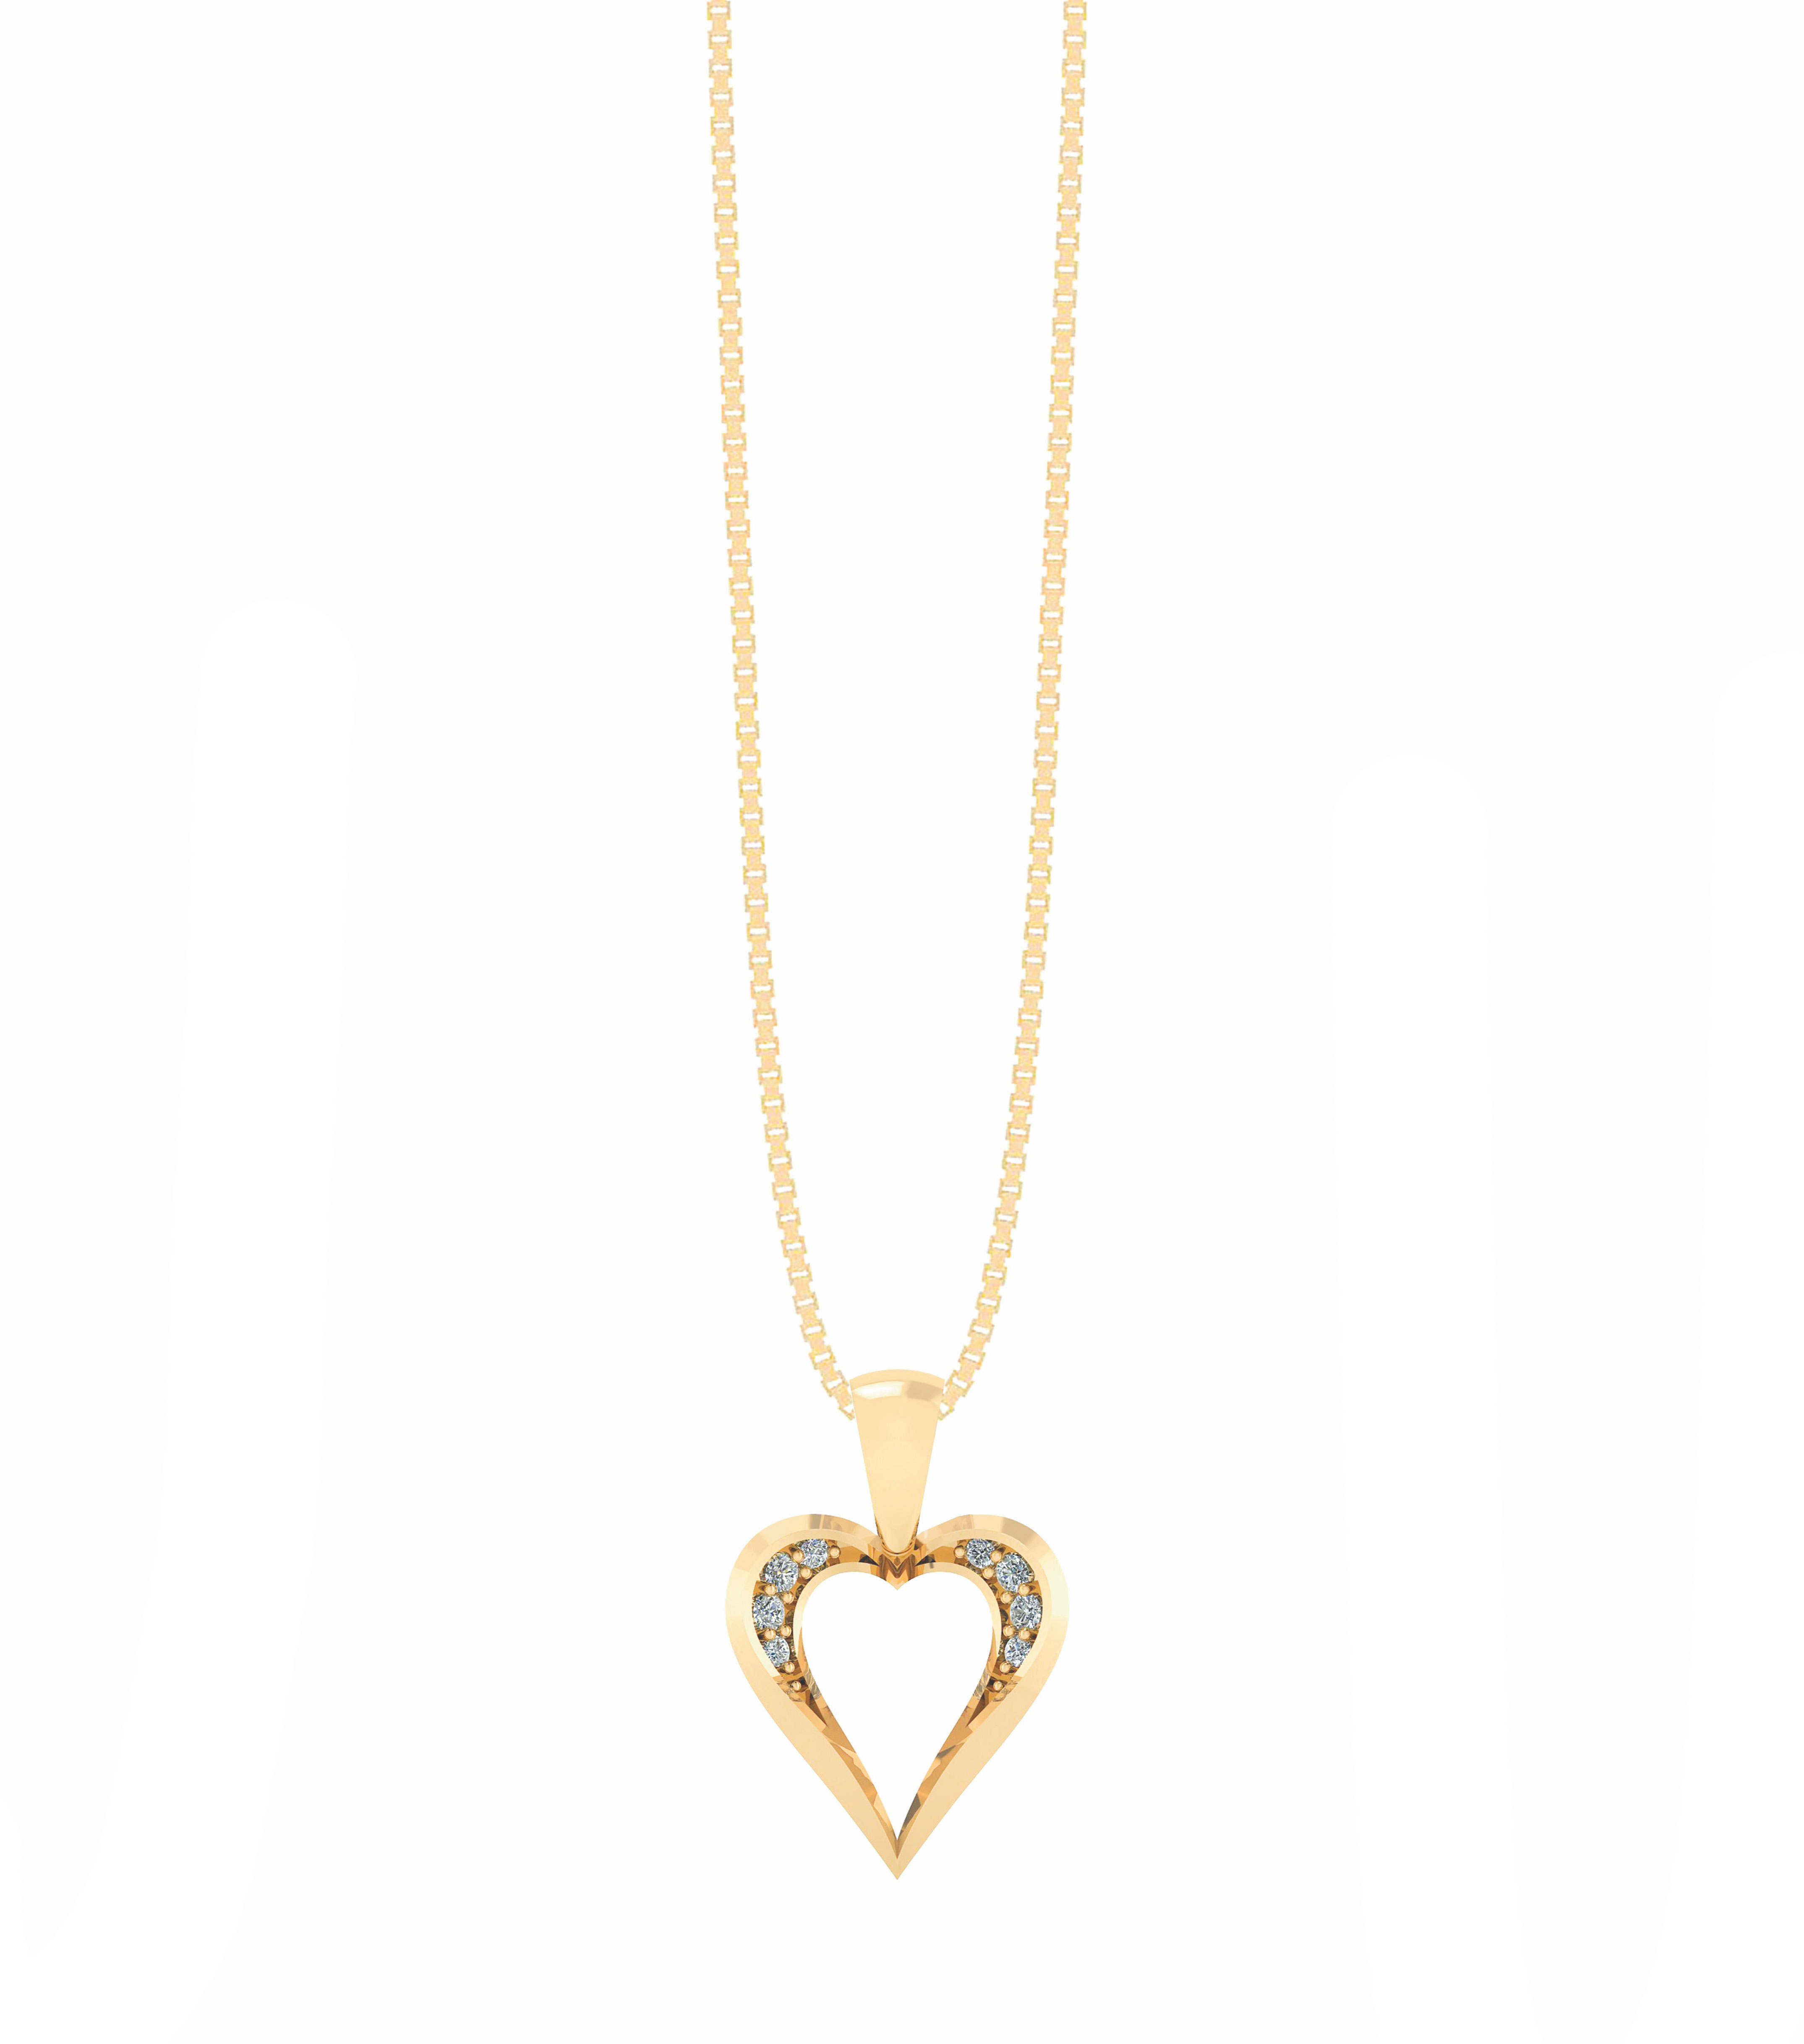 Hjerte Forgyldt Sølv Halskæde fra Smykkekæden ORSM006FG